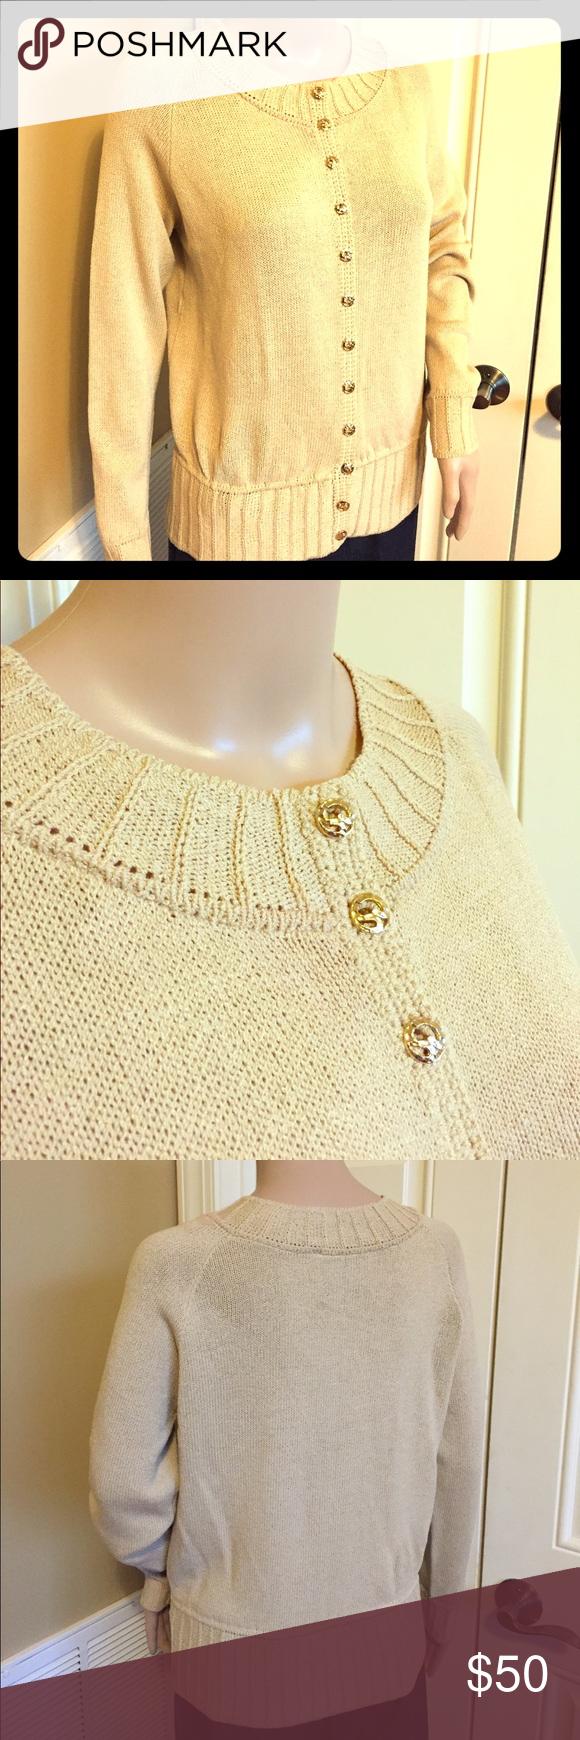 🎗ST. JOHN Vtg Light Gold/Tan Knit Cardigan🎗 | Gold cardigan and ...